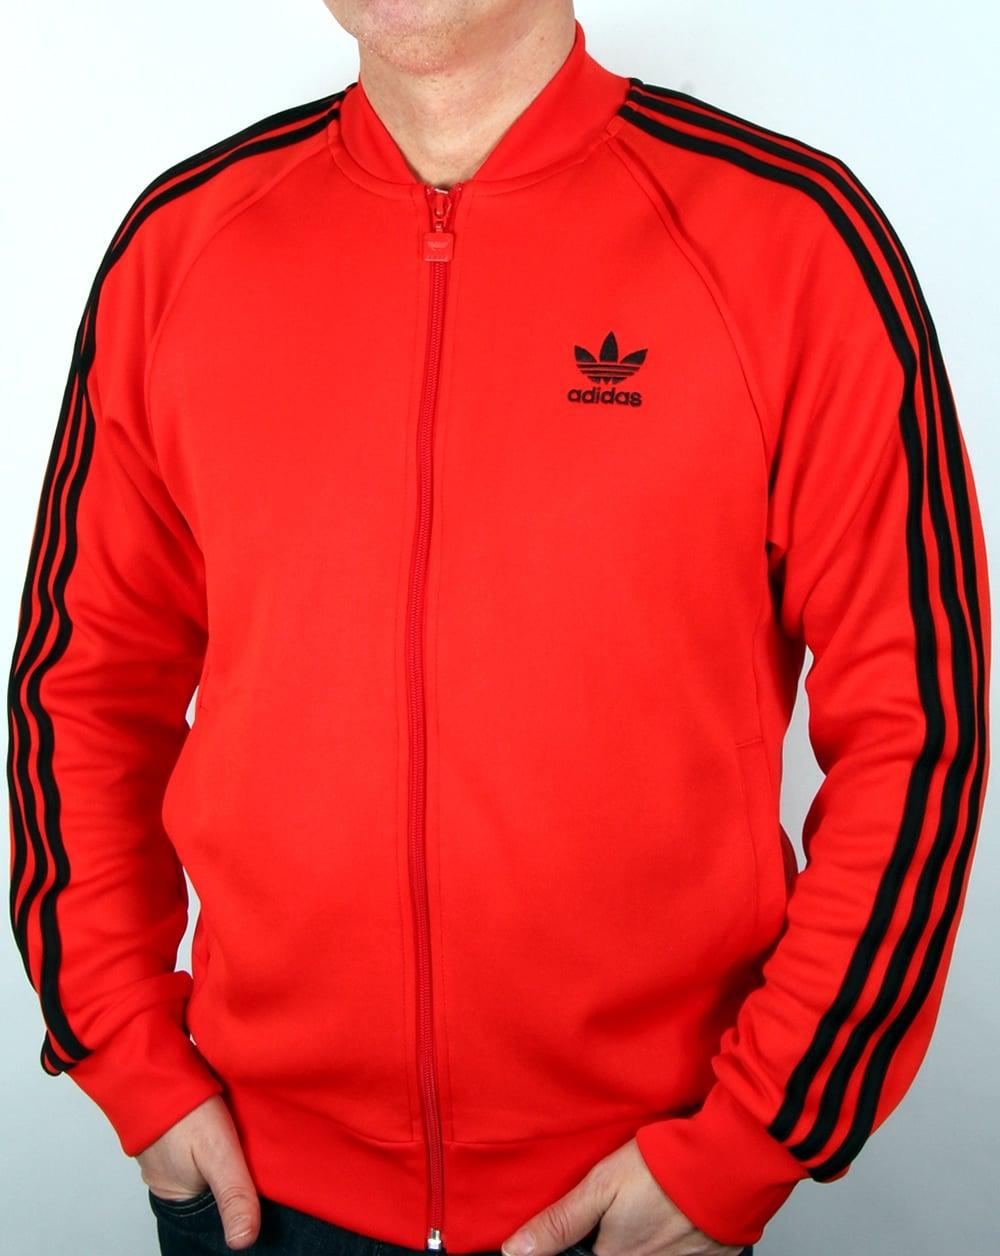 Adidas Originals Superstar Track Top Core Red, Men's, Jacket